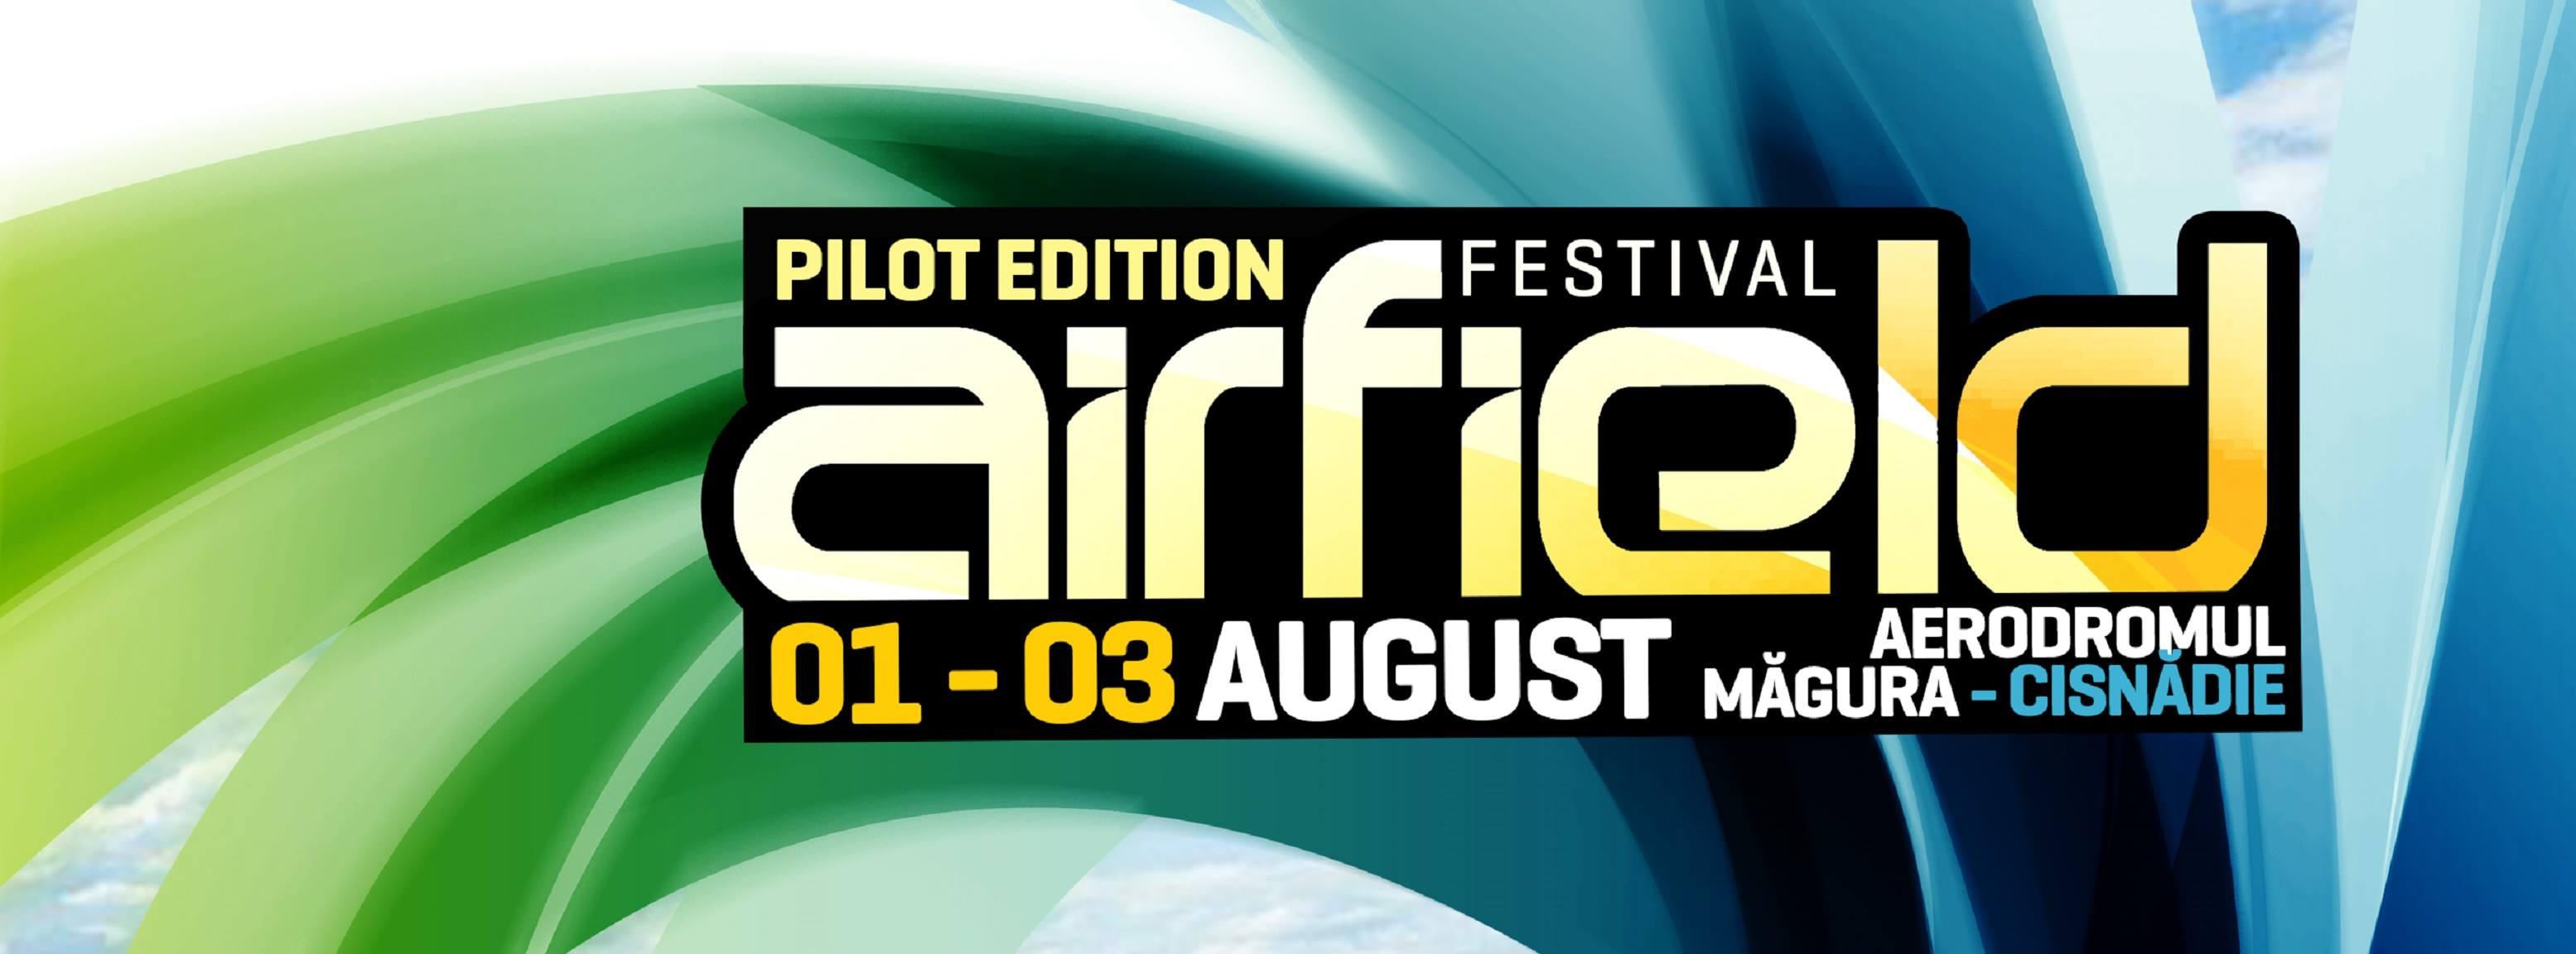 Airfield Airfield Airfield Festival - trecut, prezent și viitor 2014 07 aviator prepartyairfield